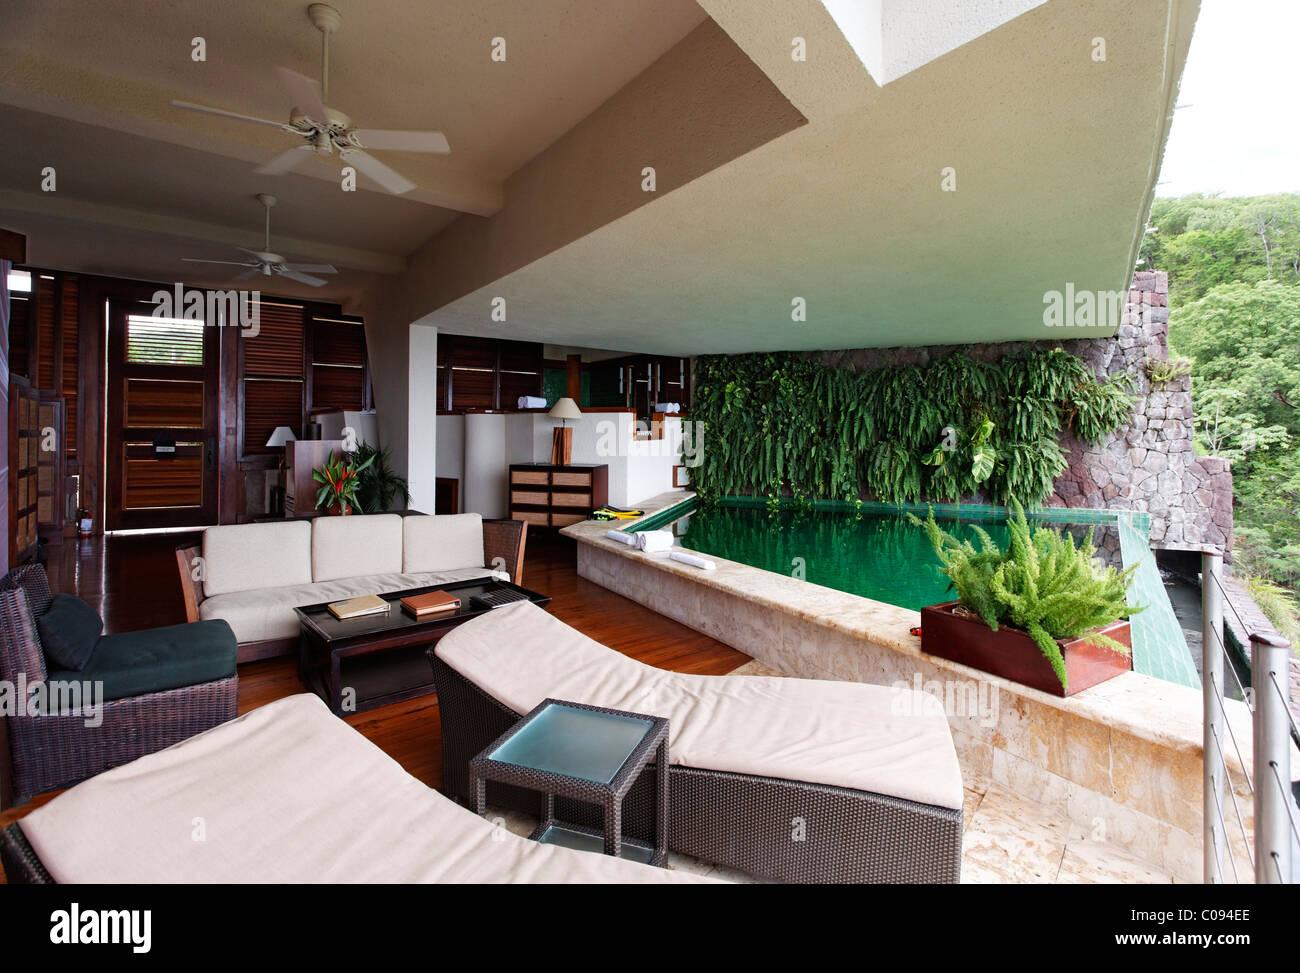 Suite, sin pared exterior, tumbonas, piscina infinety, Jade Mountain luxury hotel, Santa Lucía, Islas de Barlovento, Imagen De Stock